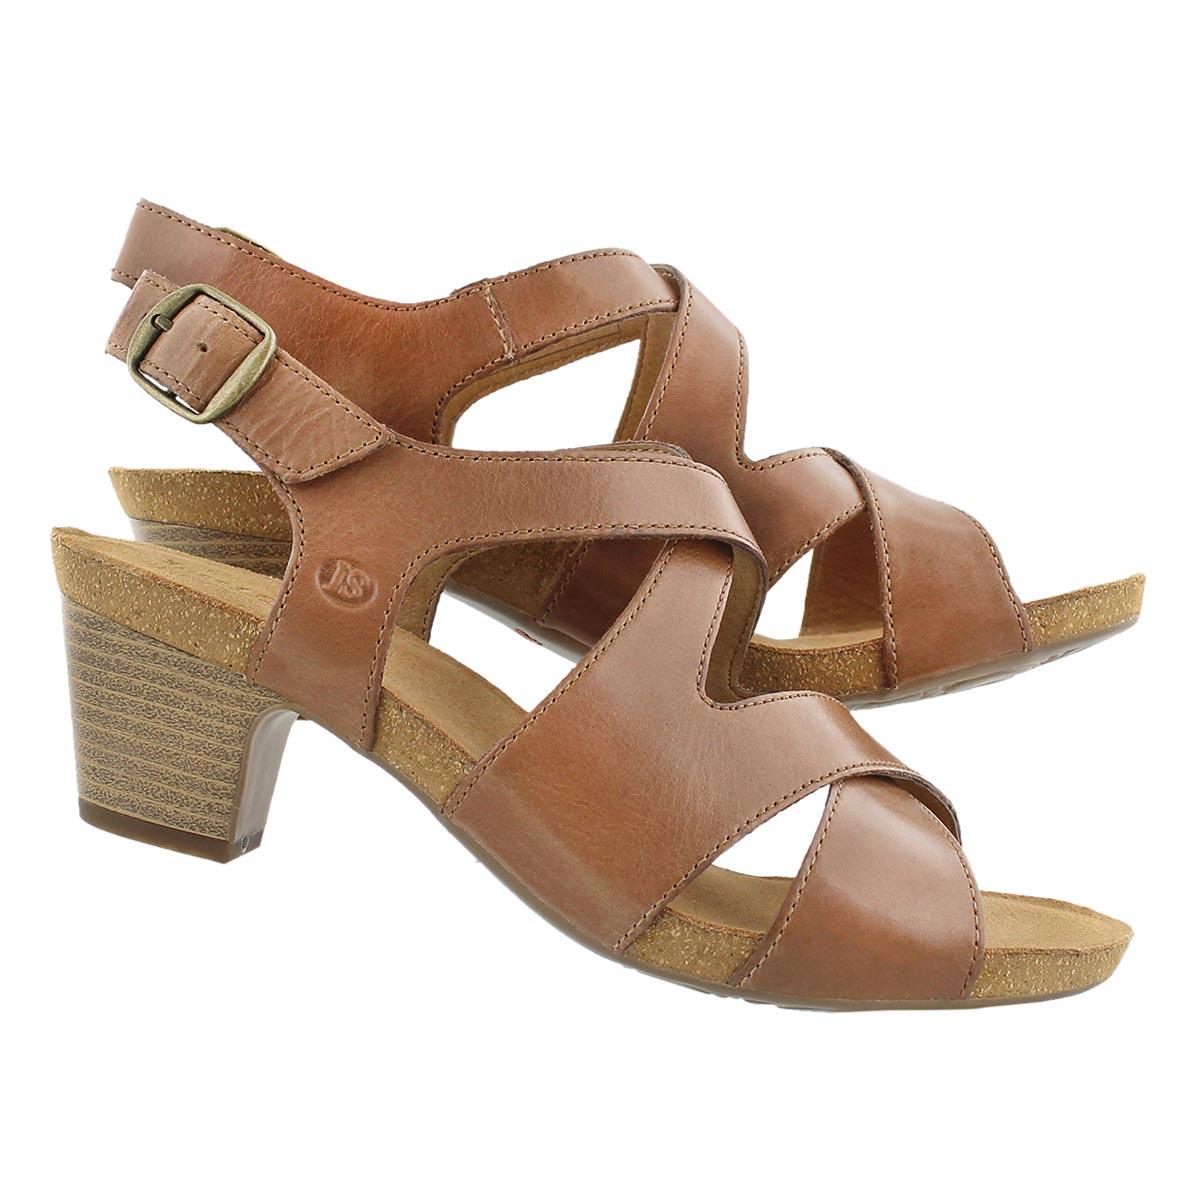 Lds Ruth 15 brn cross strap dress sandal